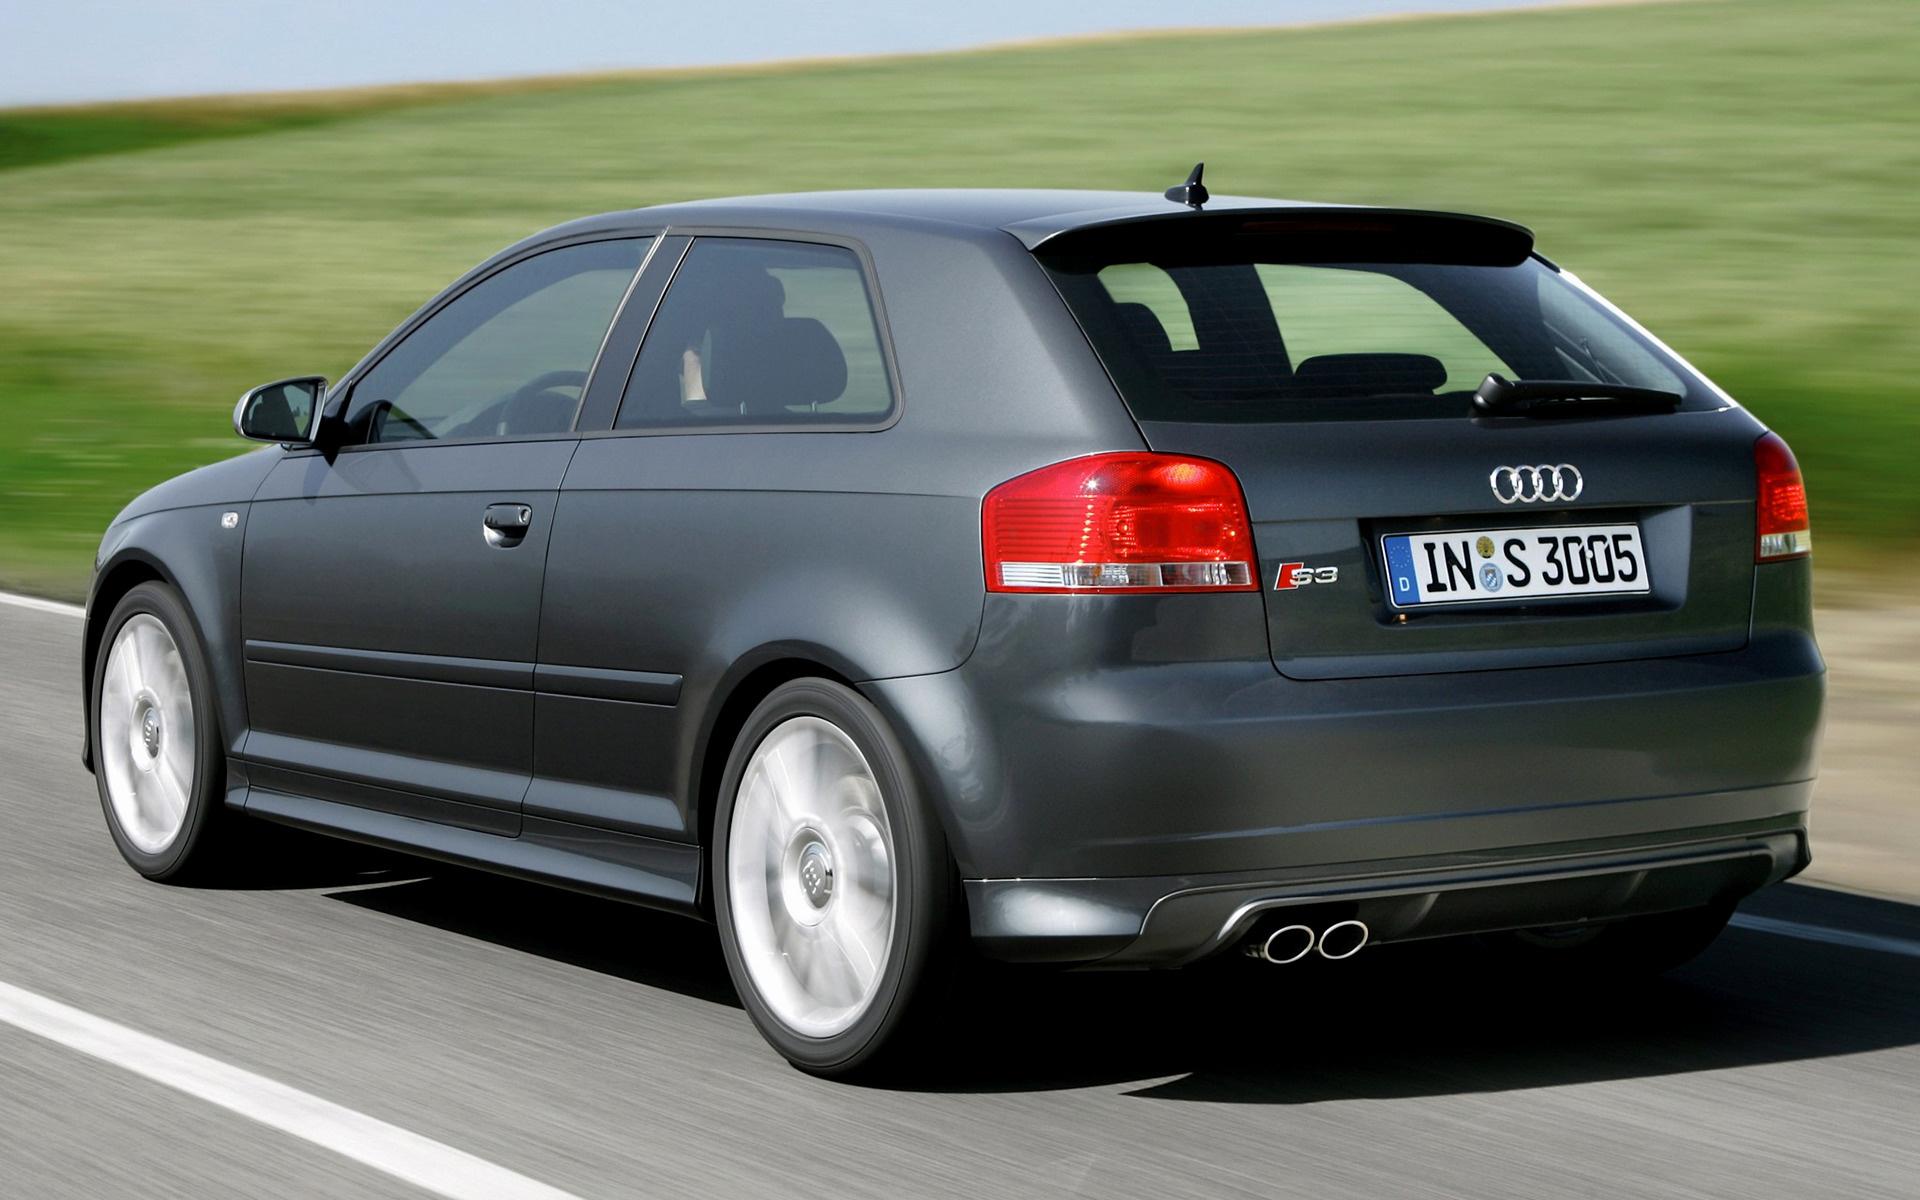 Kekurangan Audi S3 2006 Harga